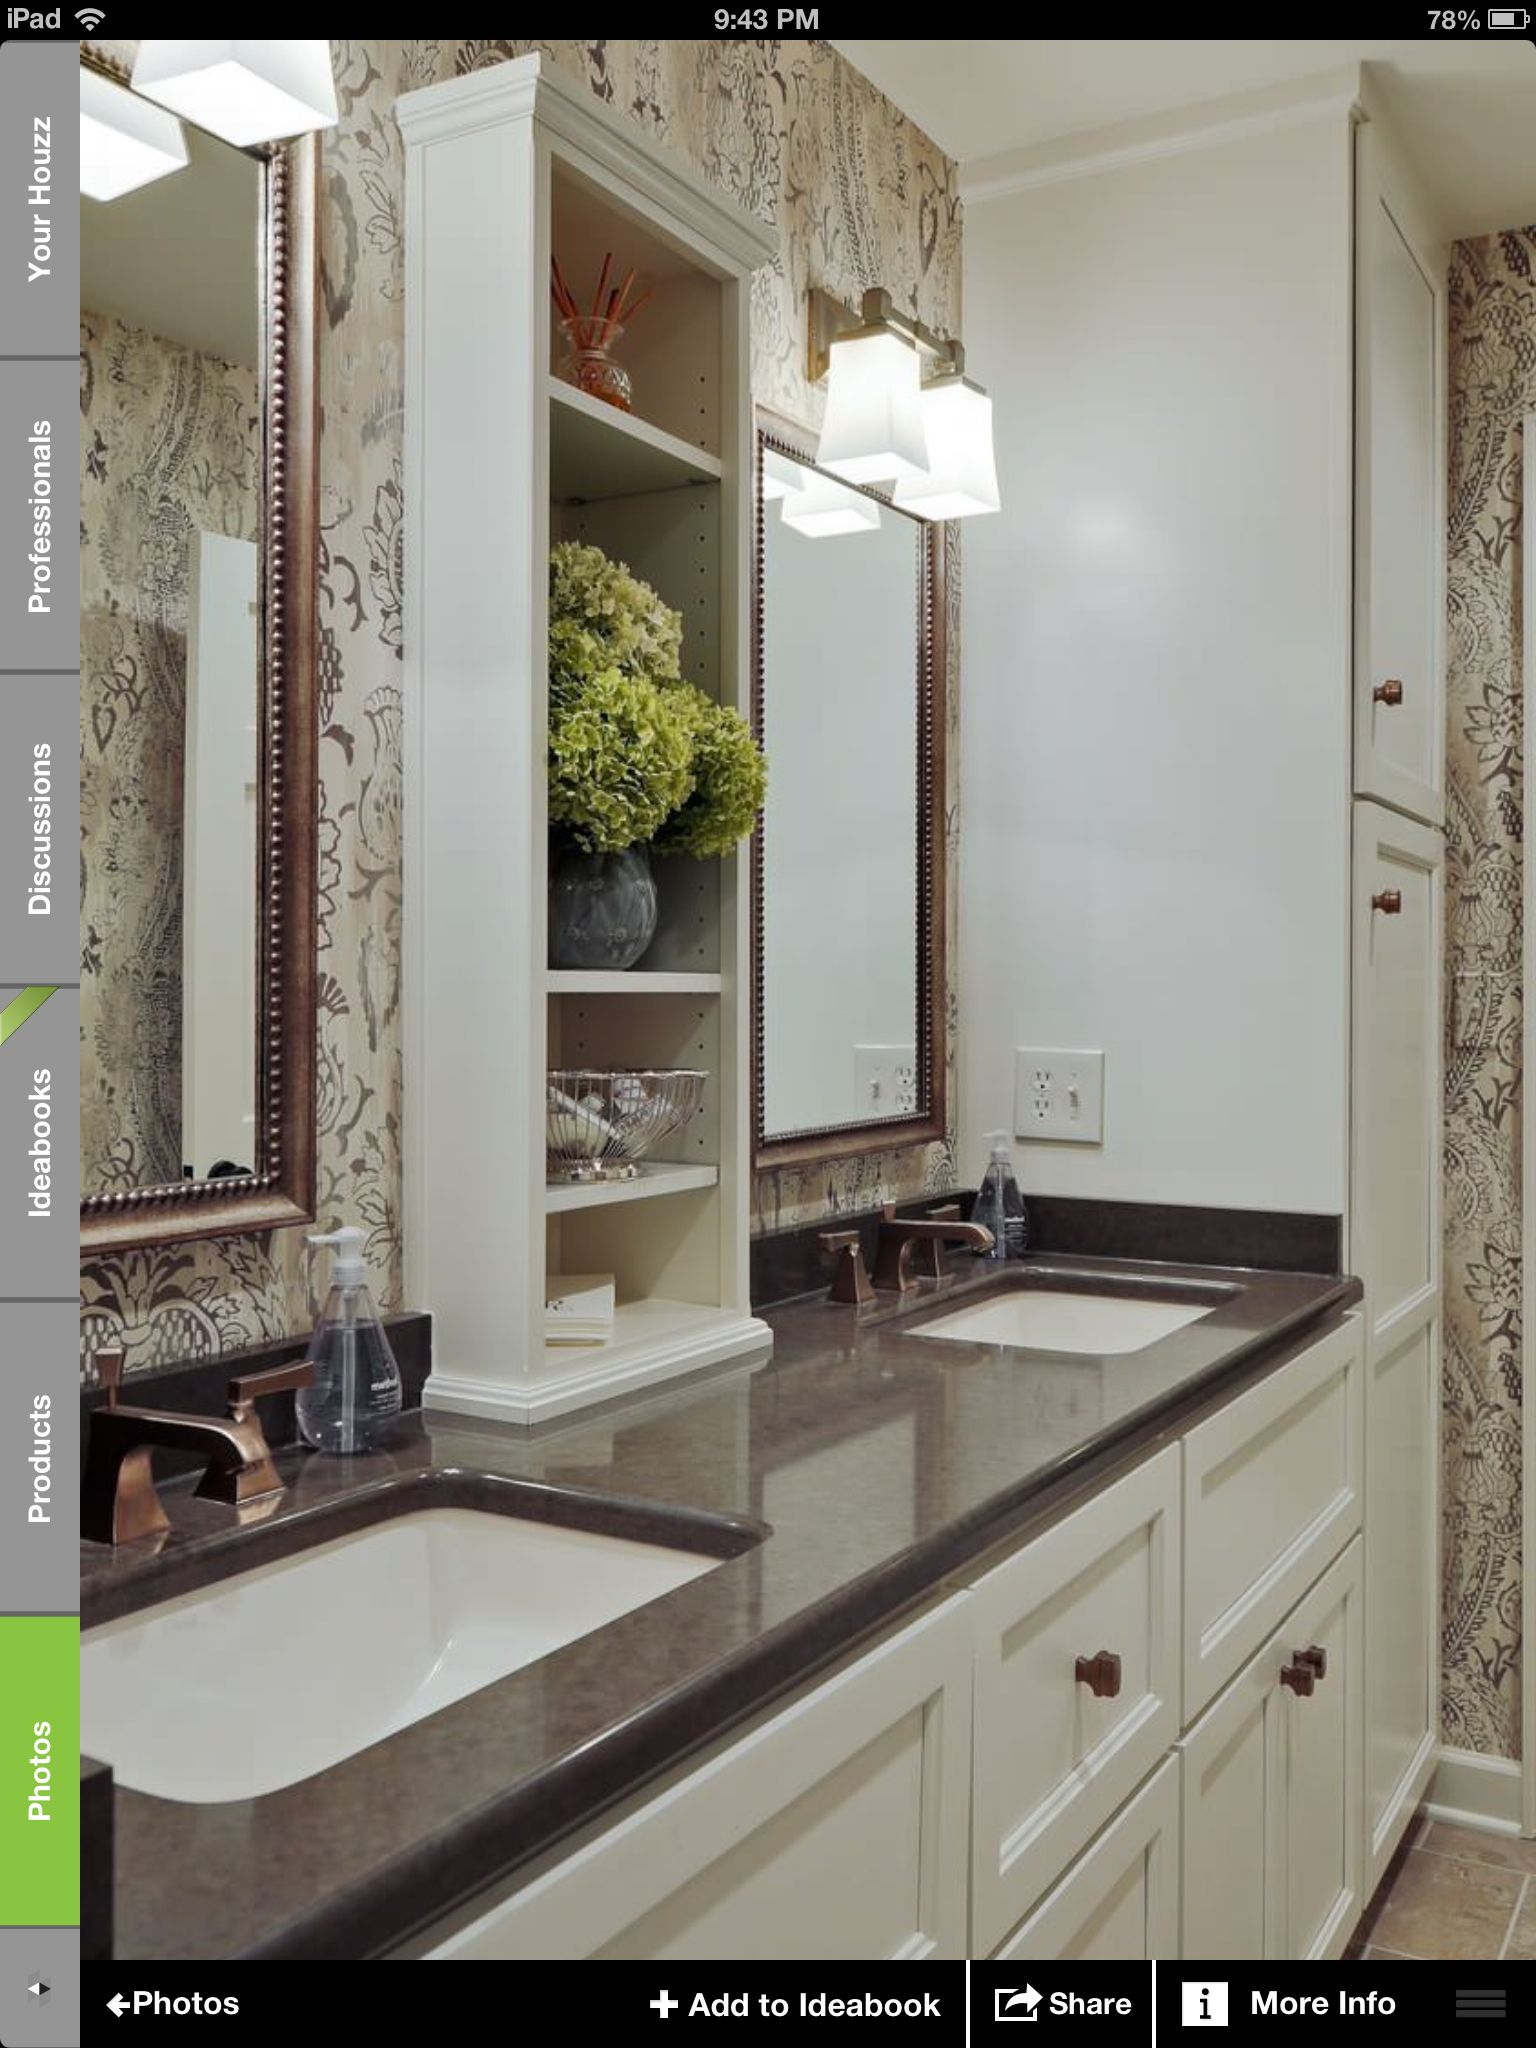 Vanity Shelf To Build 6x12x42 Open Back To Mirror Bath